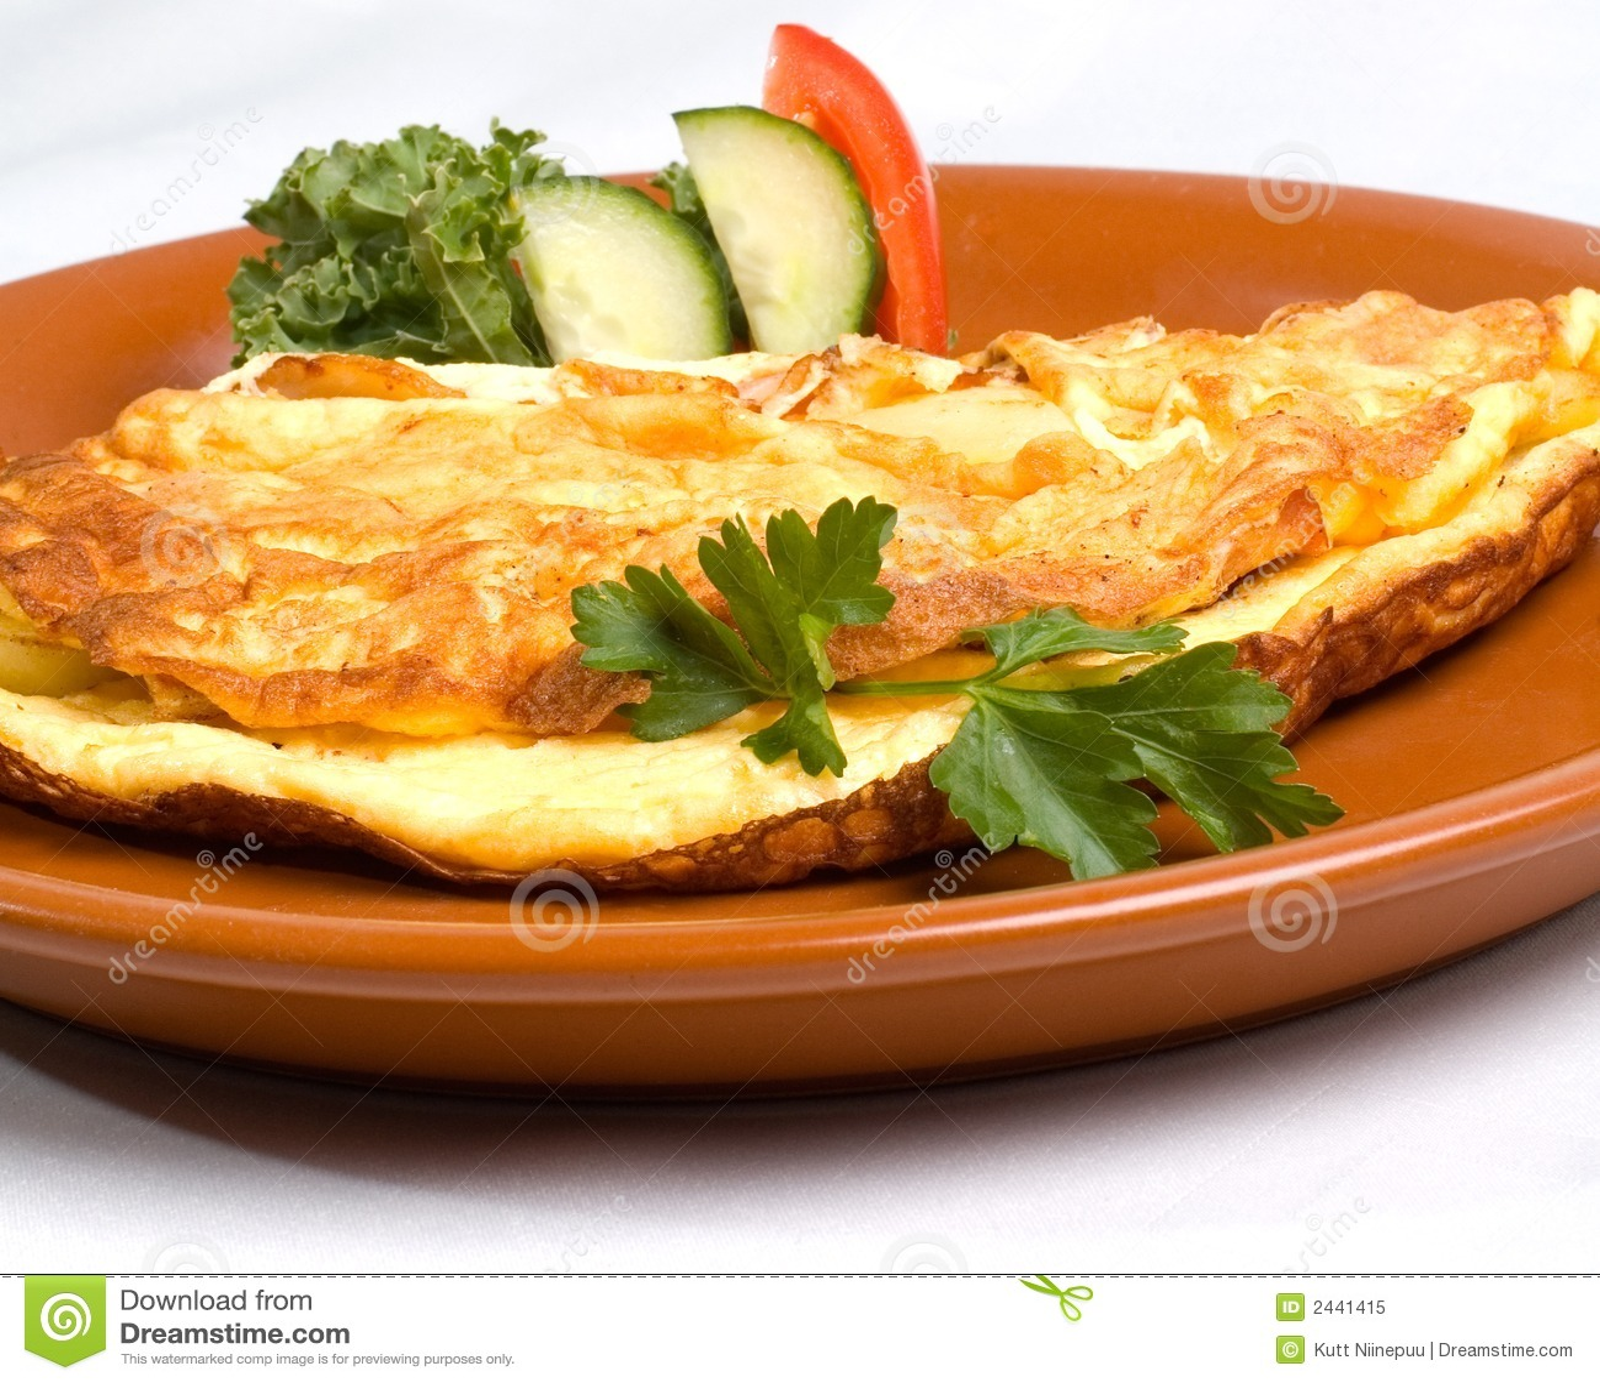 Omeleta com presunto & queijo